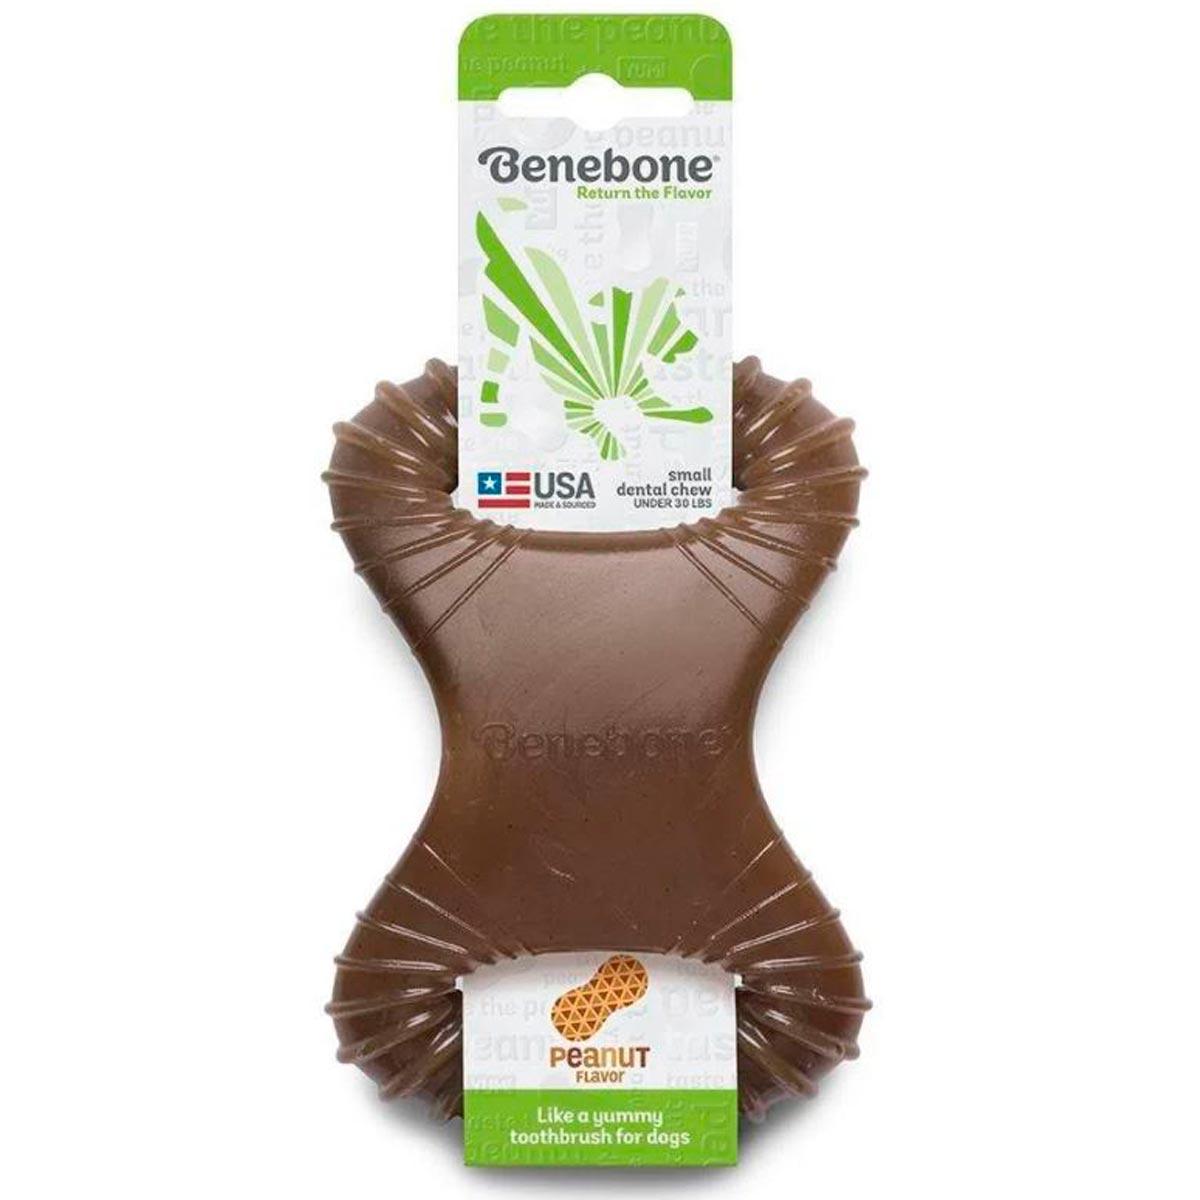 Brinquedo Benebone Dental Chew Amendoim